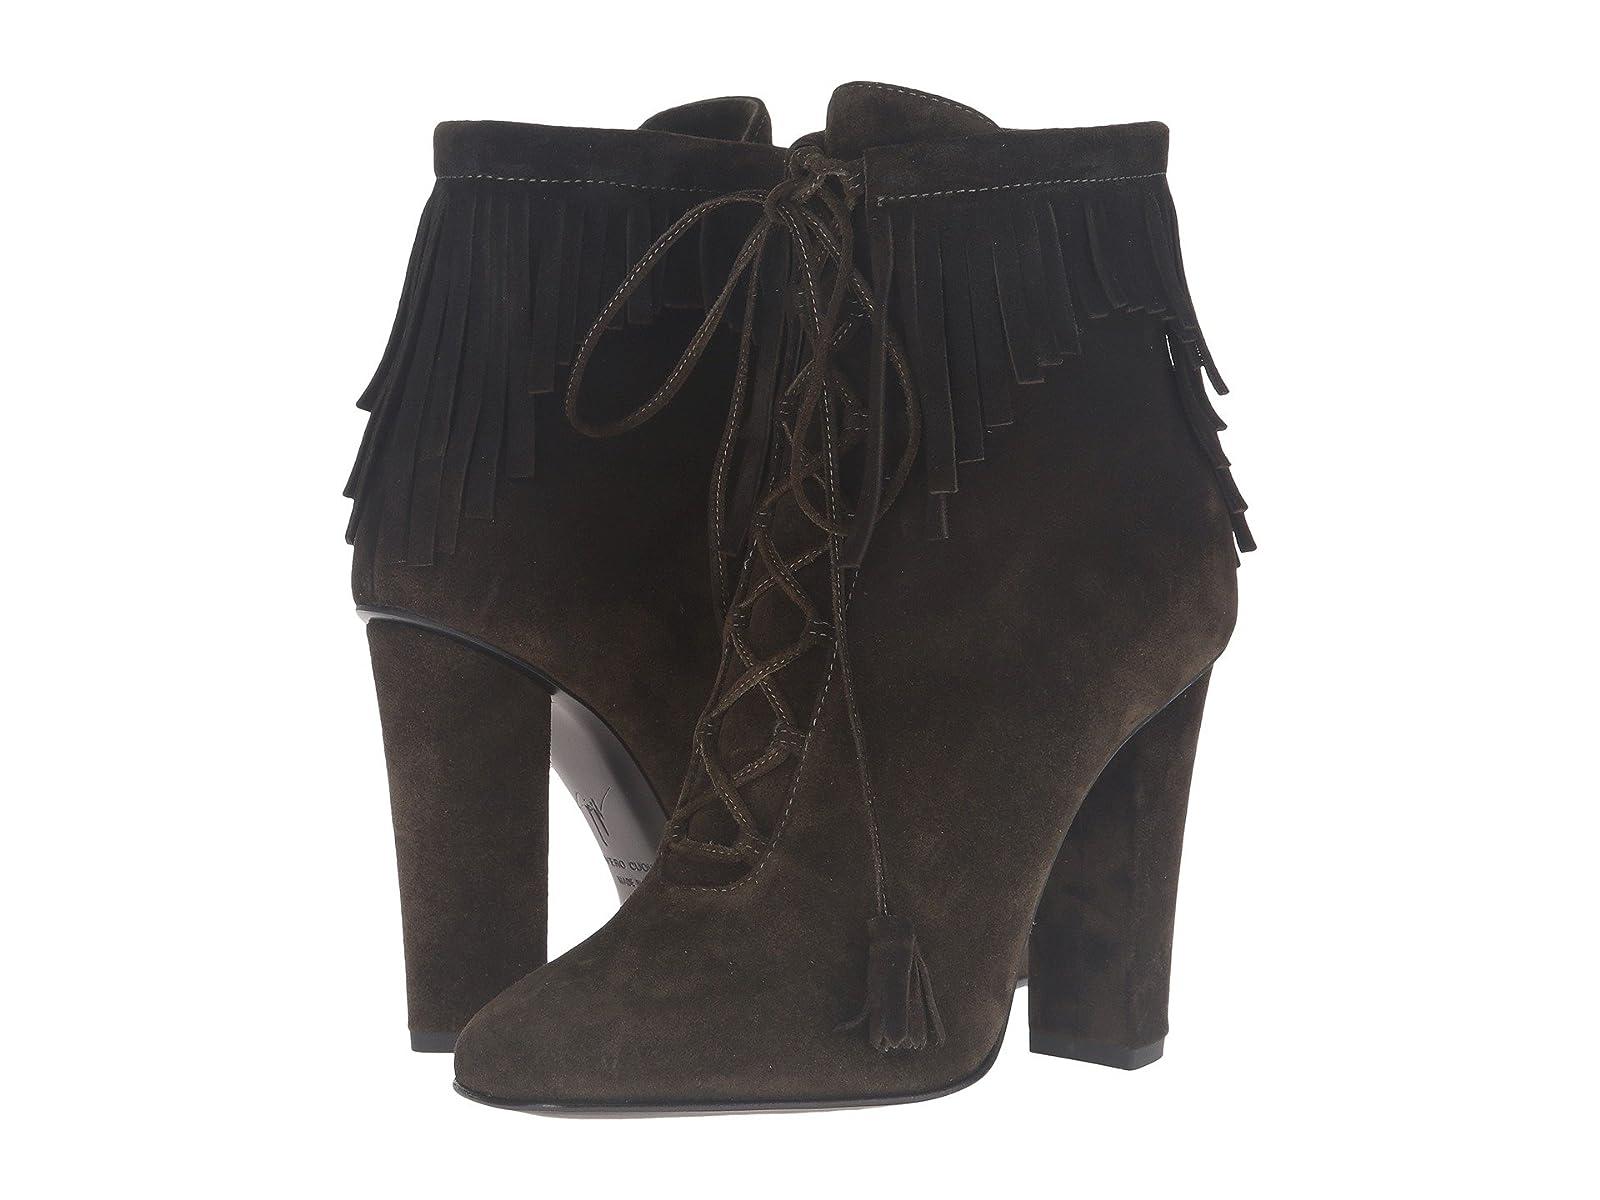 Giuseppe Zanotti I67090Cheap and distinctive eye-catching shoes